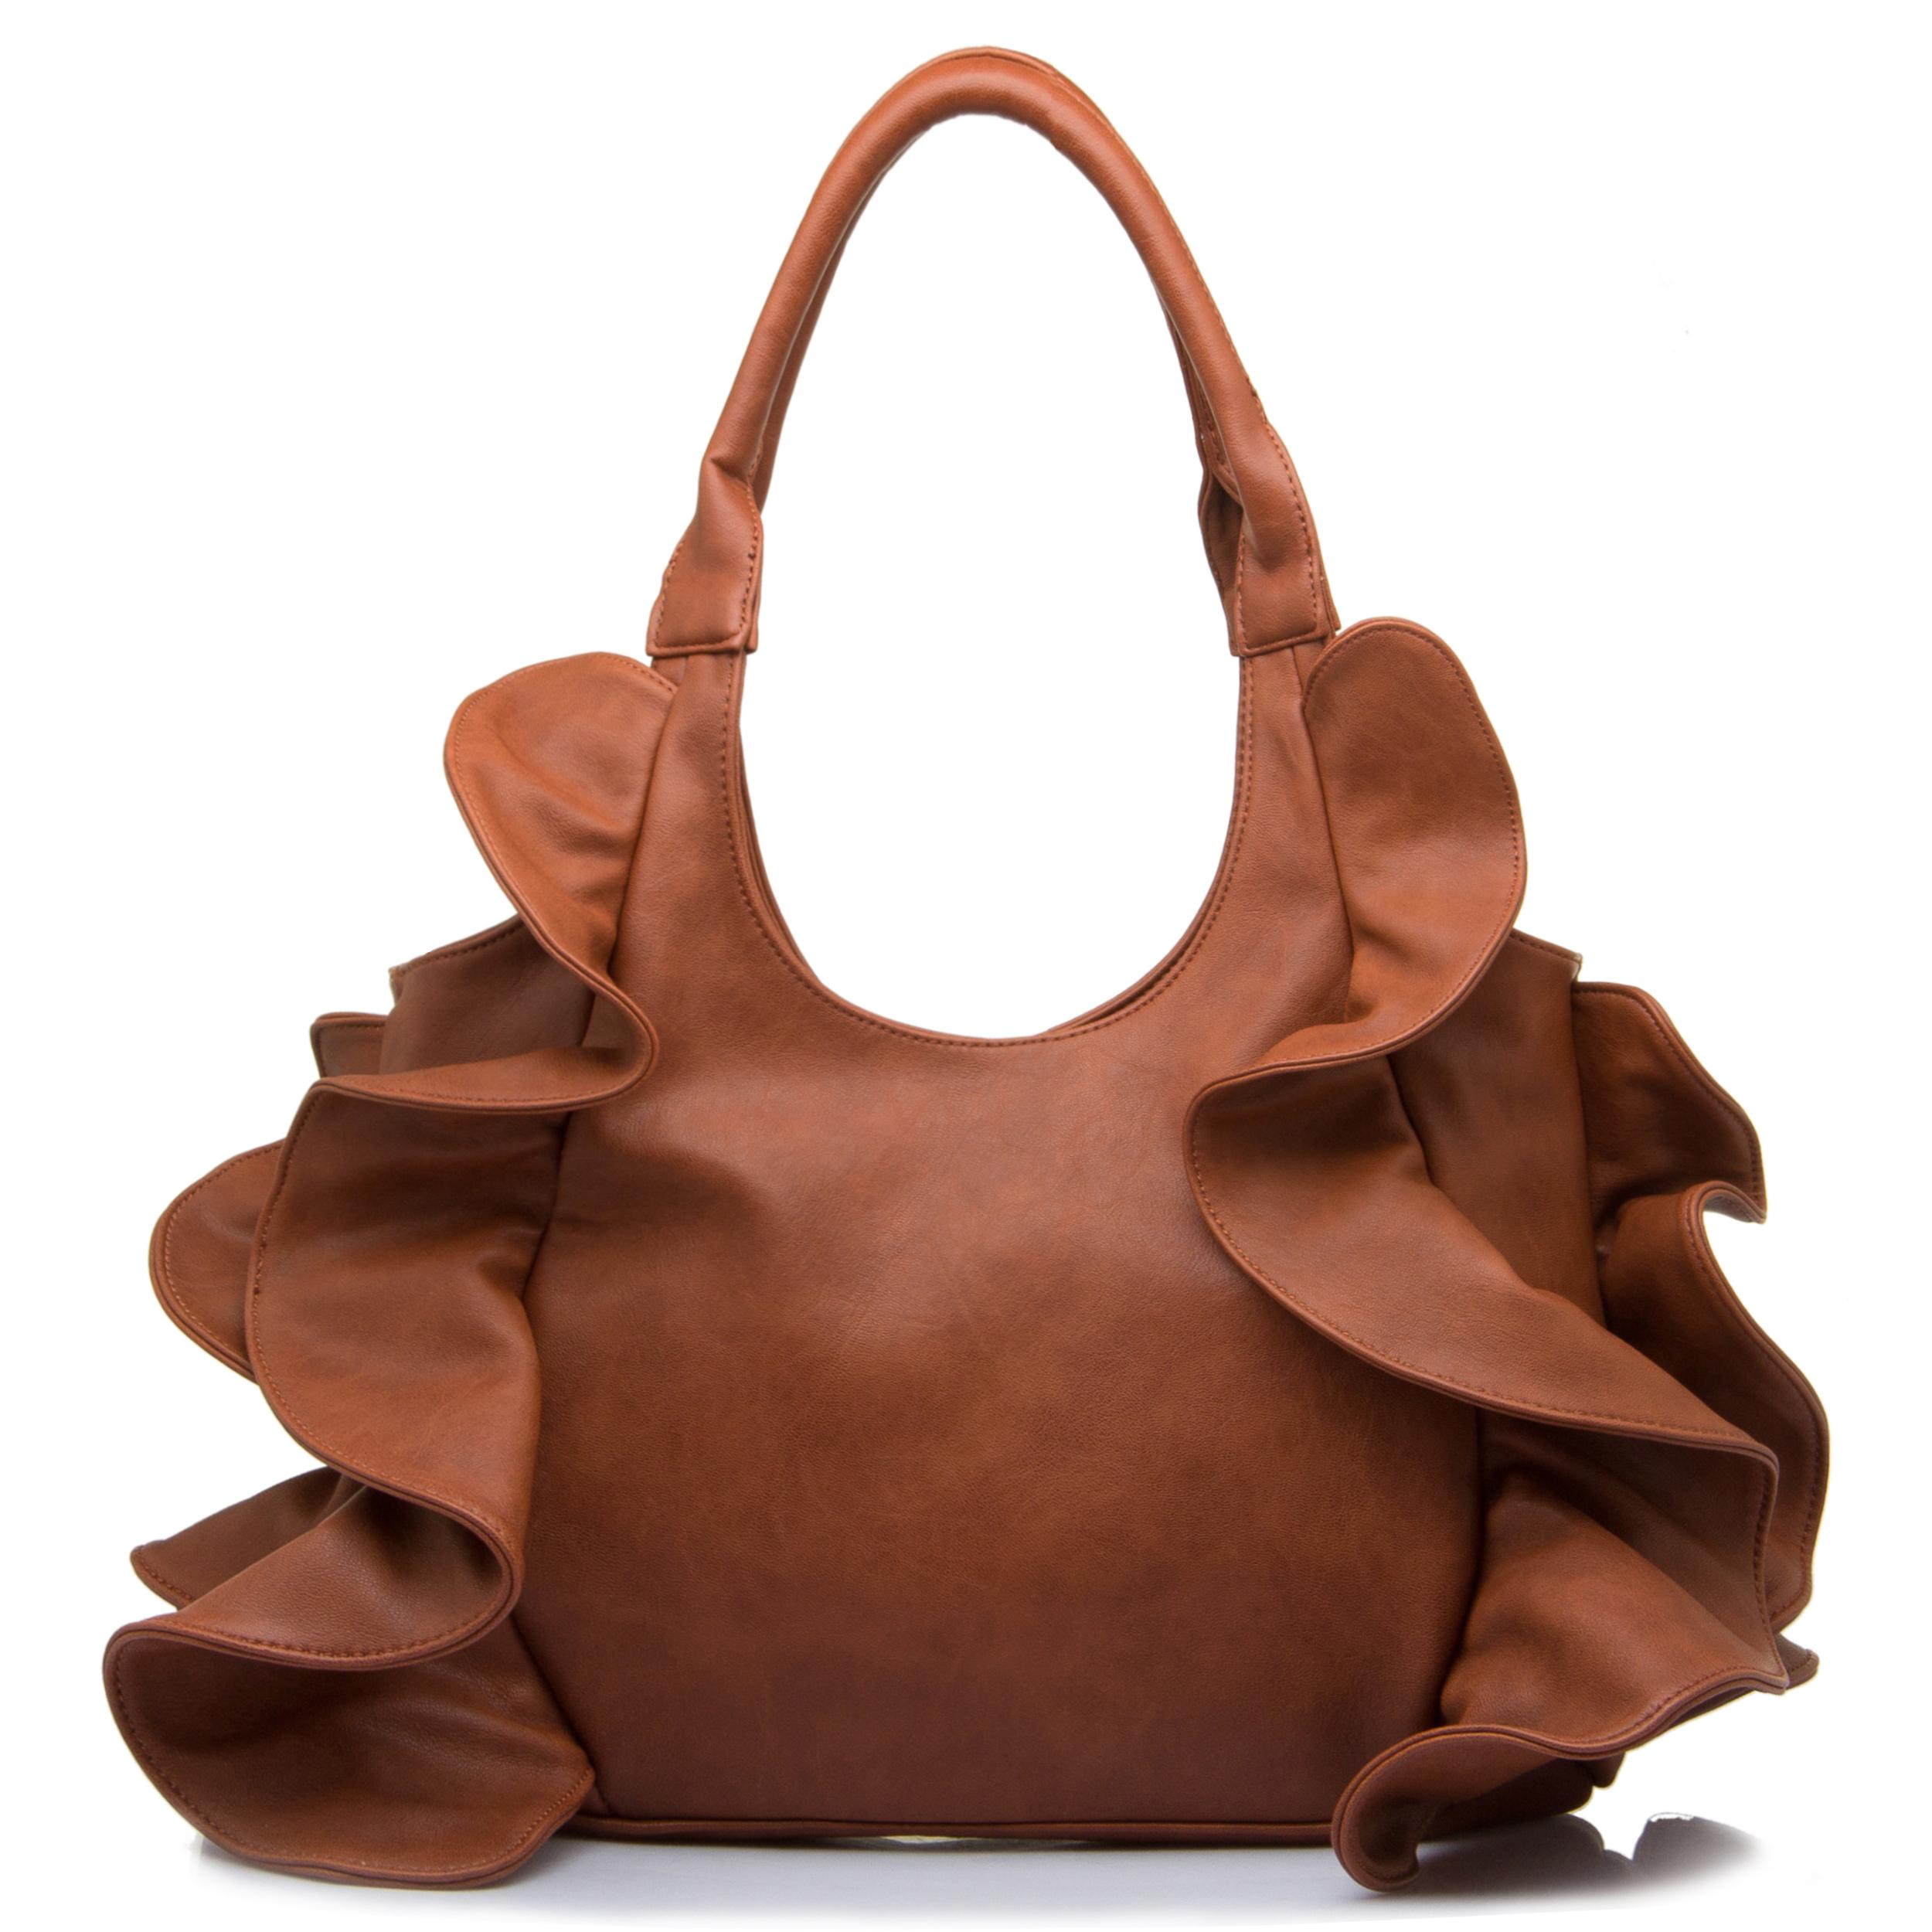 Sora flirty ruffled hobo handbag front shot